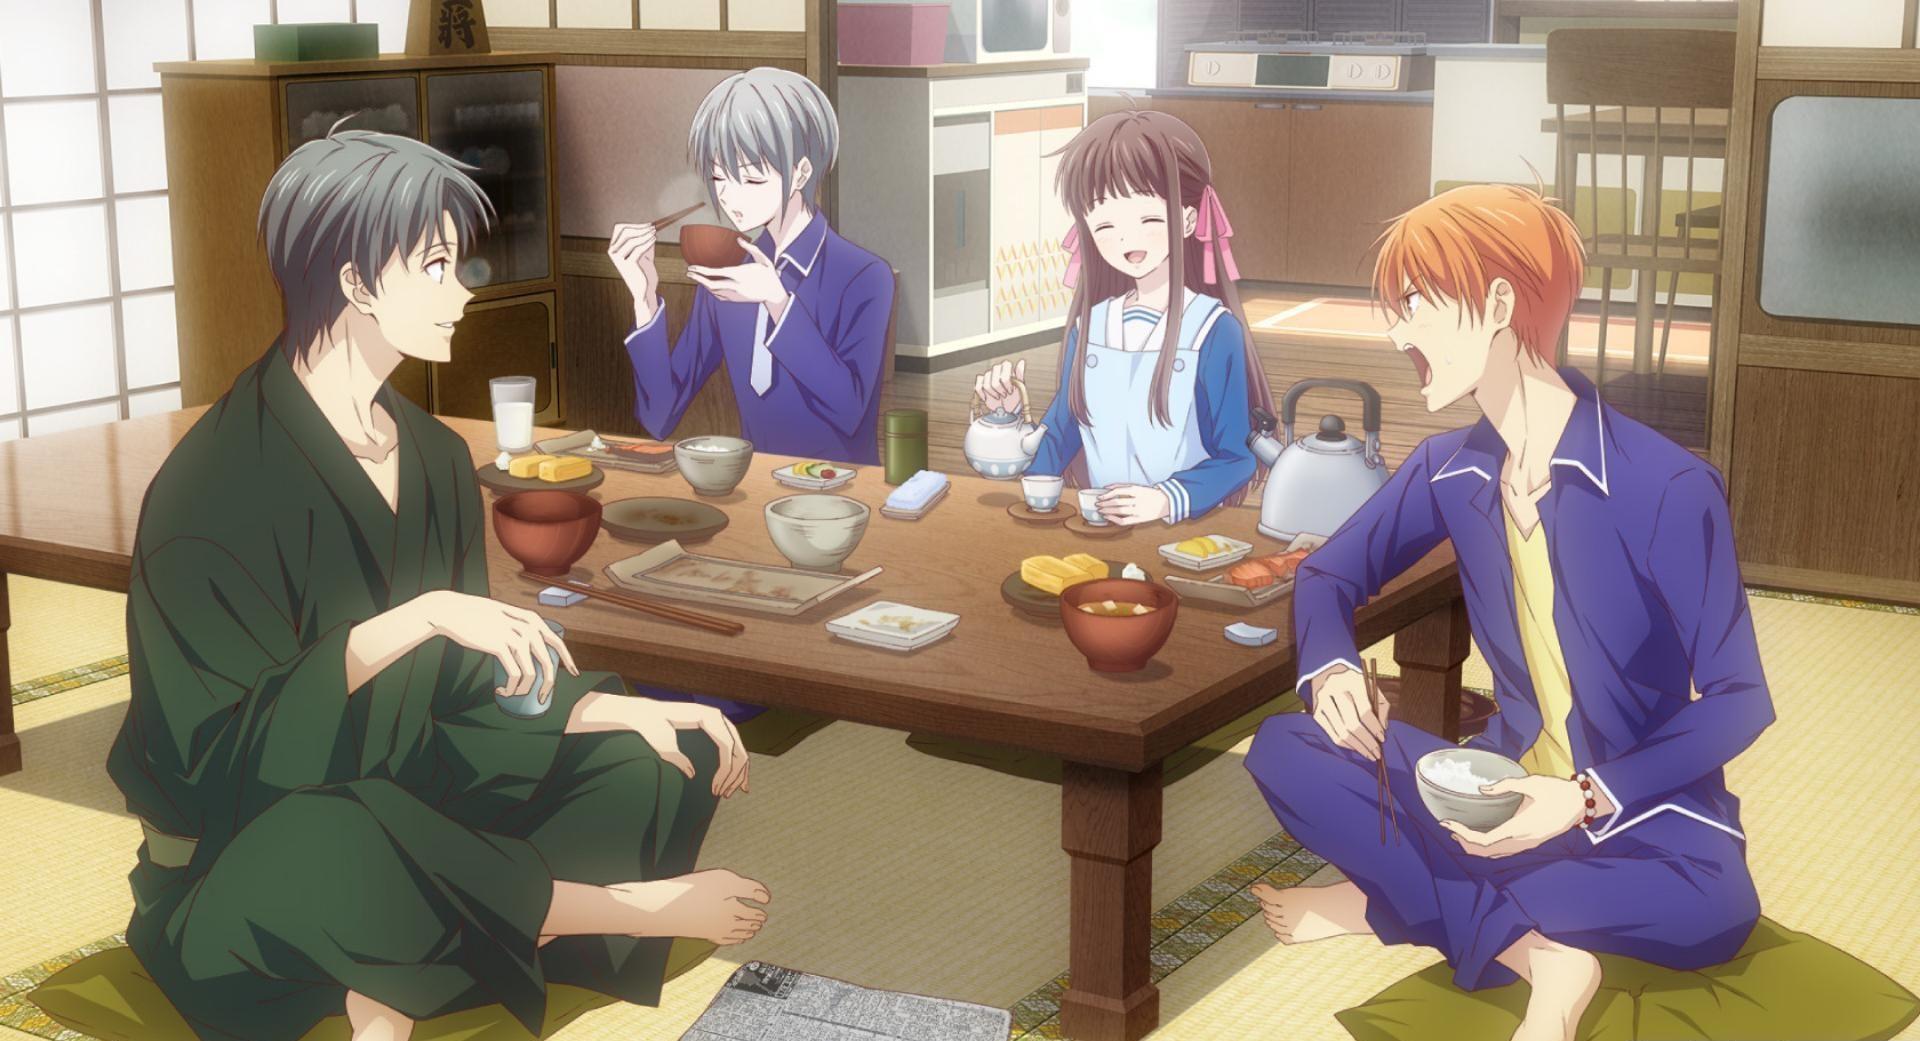 Fantasy romance anime similar to Inu X boku SS, Fruits Basket